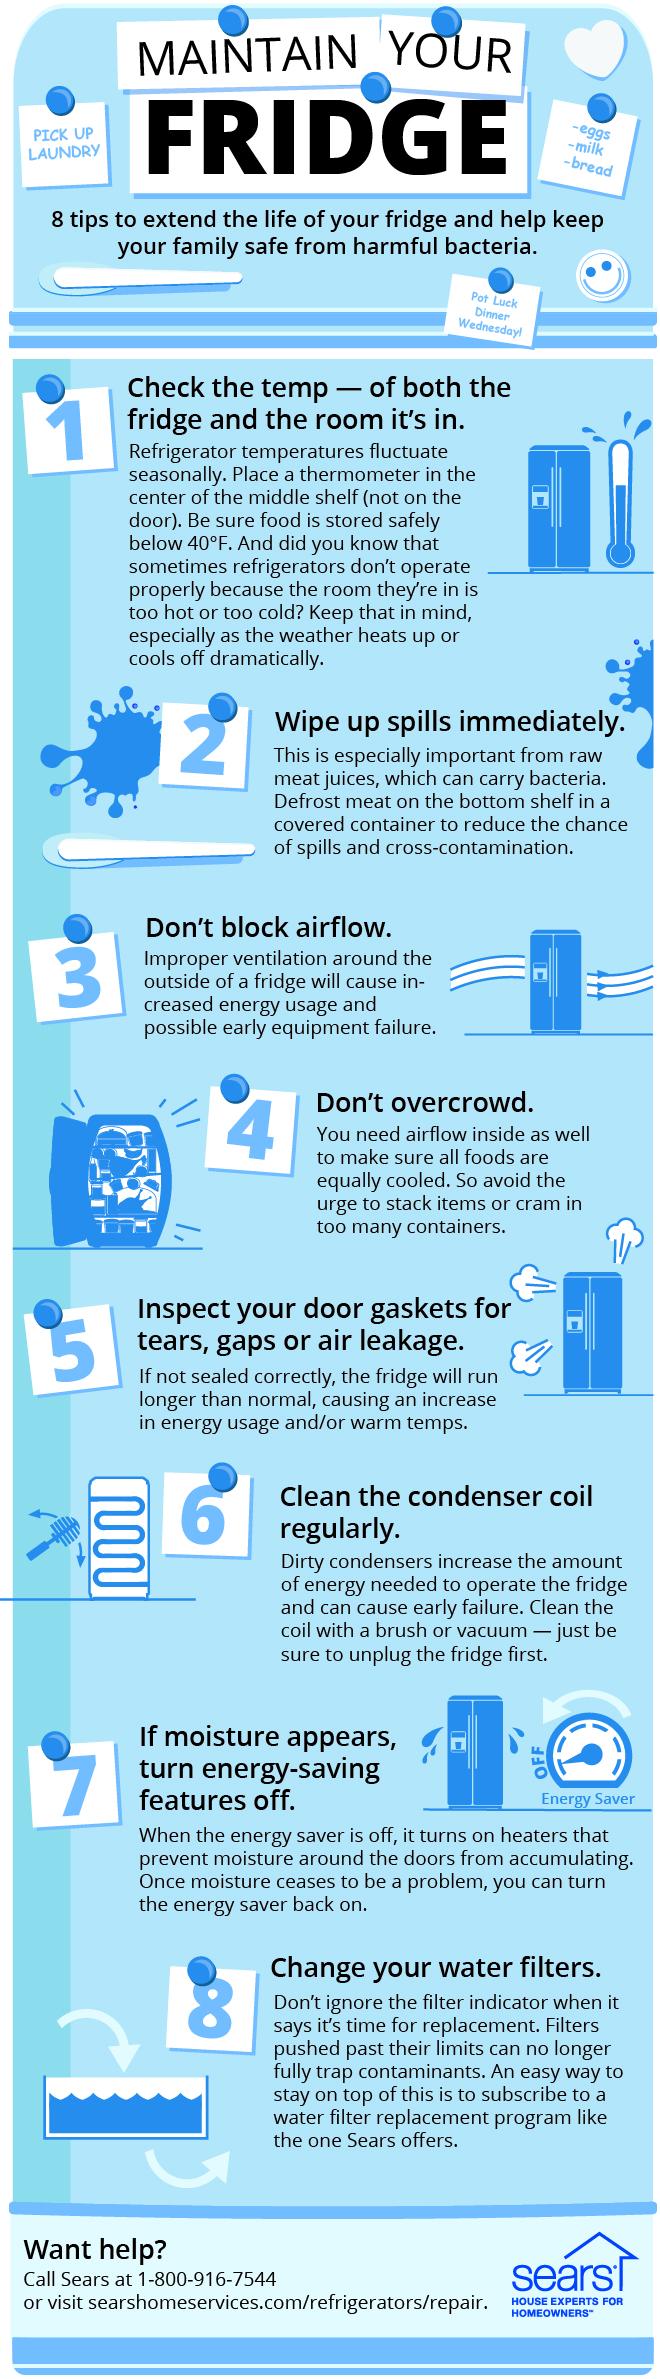 refrigerator_troubleshooting.jpg